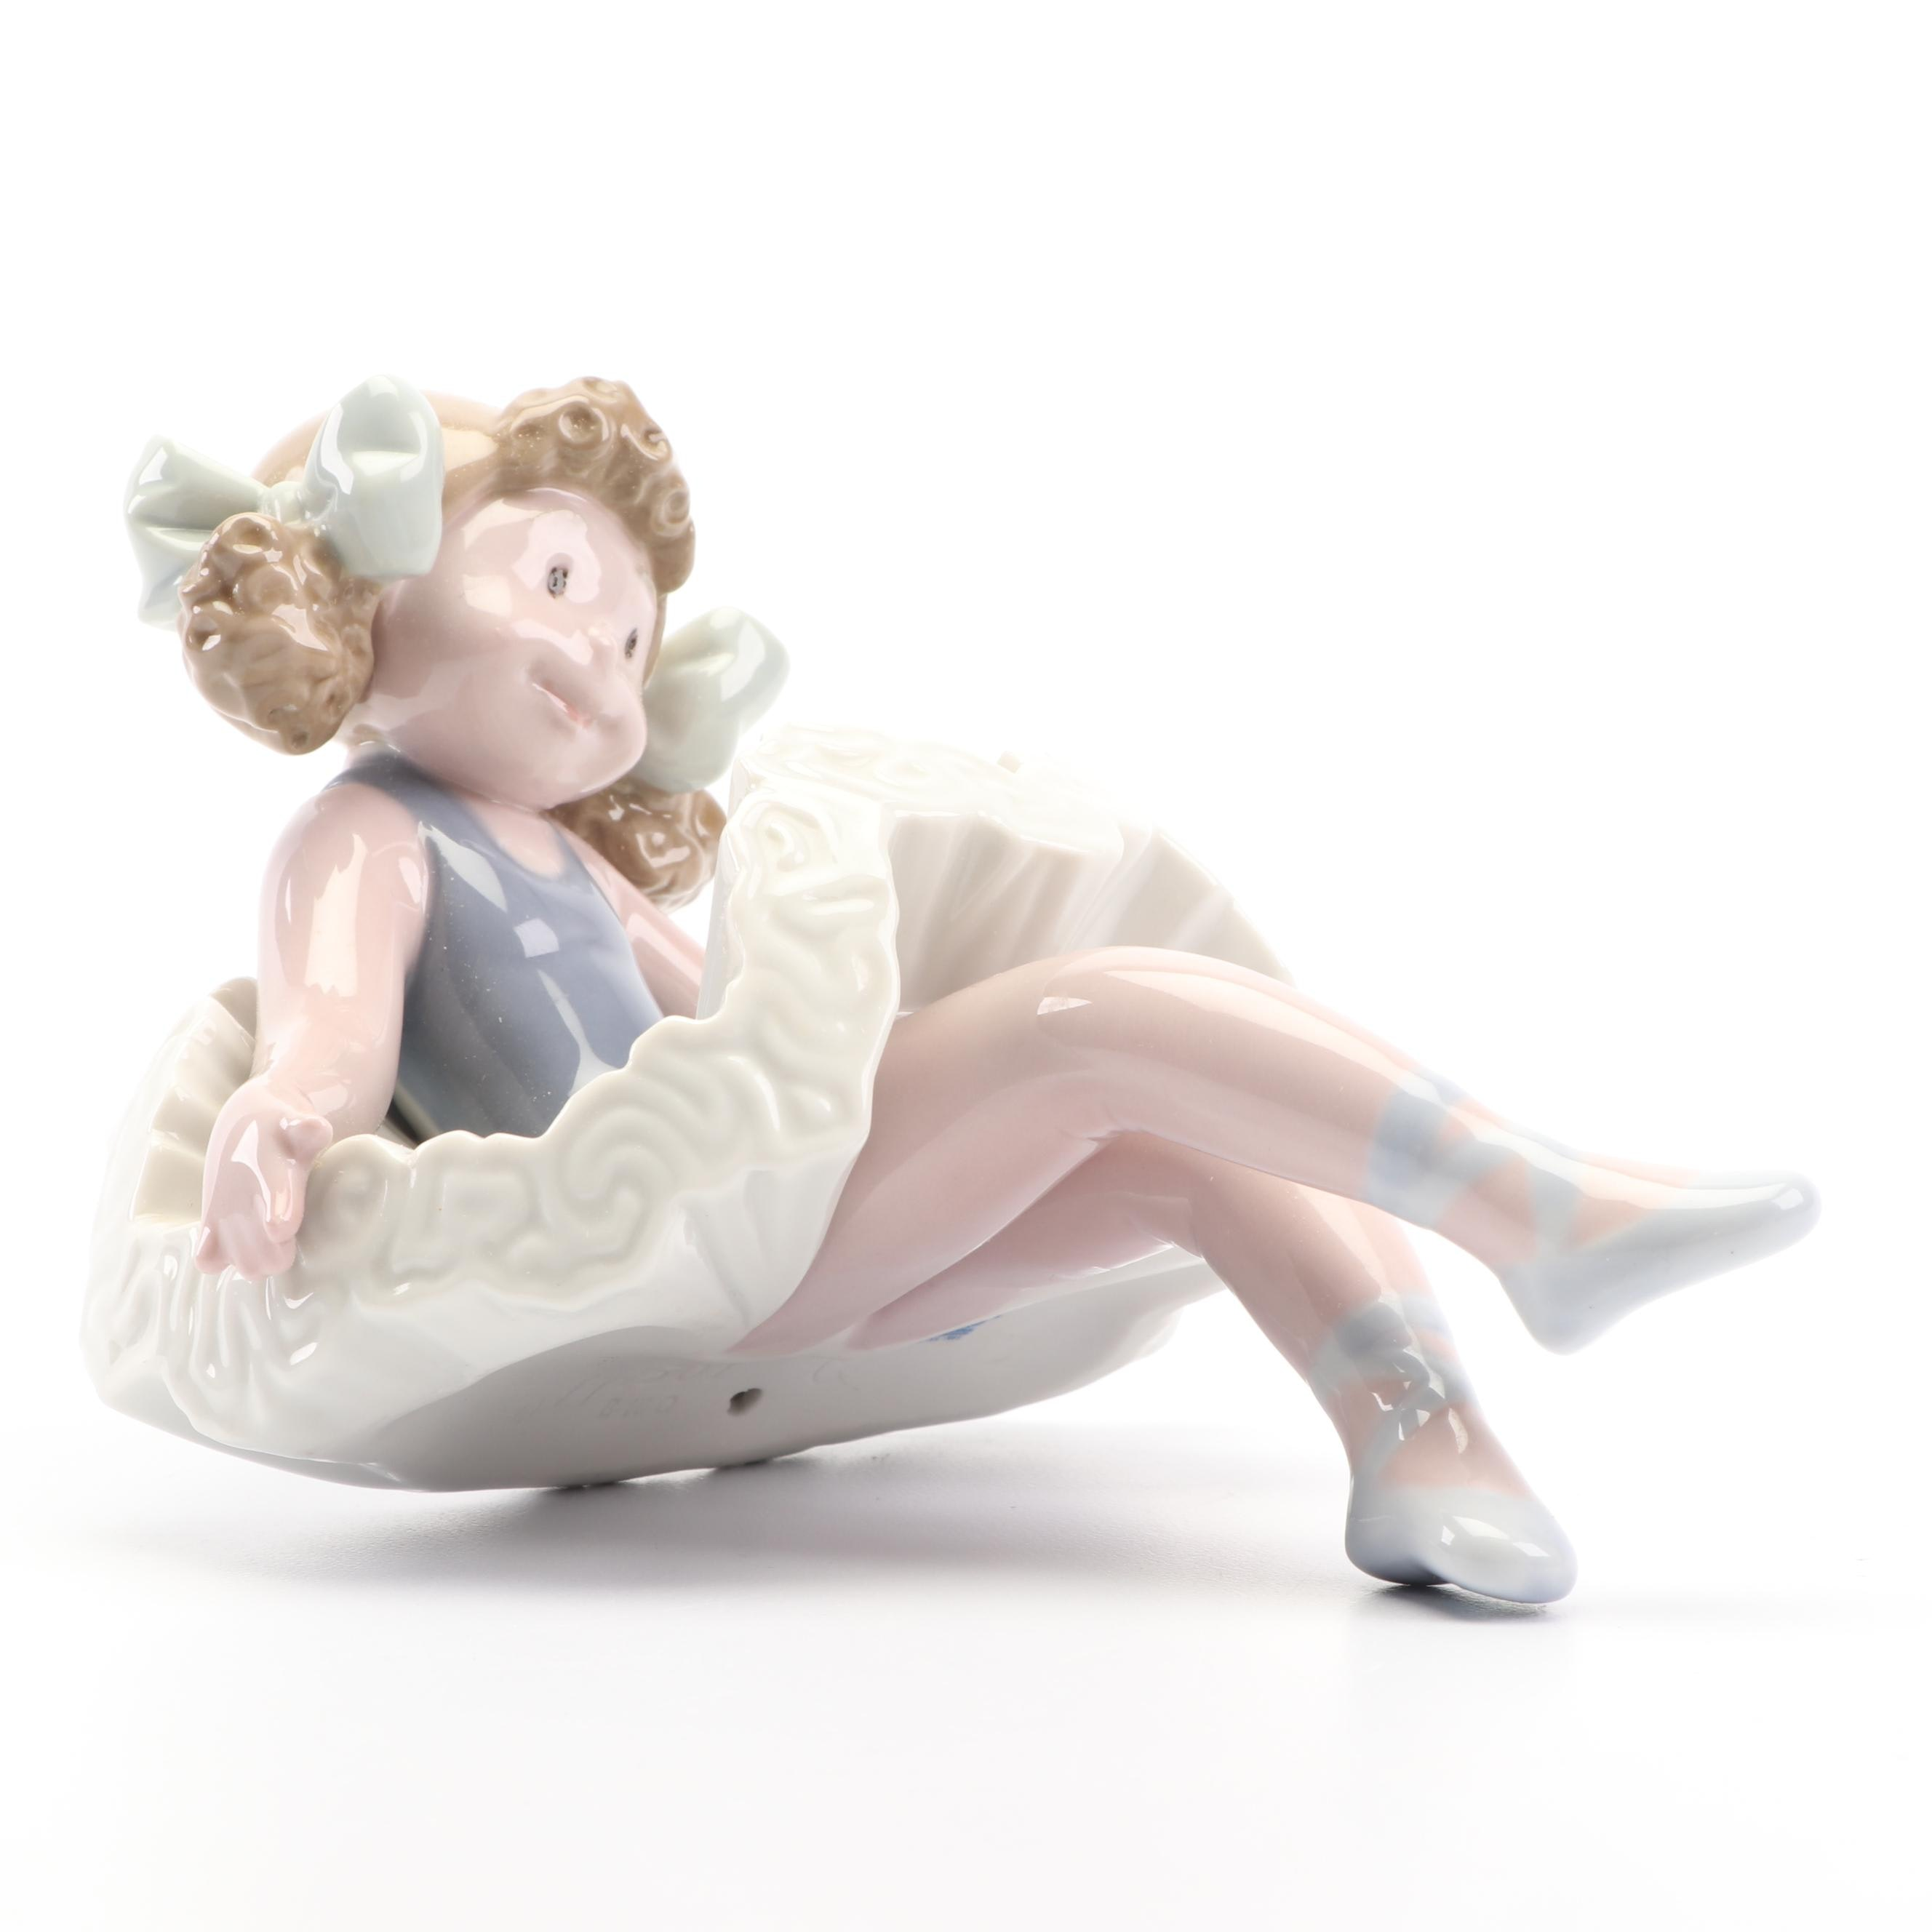 "Lladró ""Rag Doll"" Shelf Sitter Porcelain Figurine"